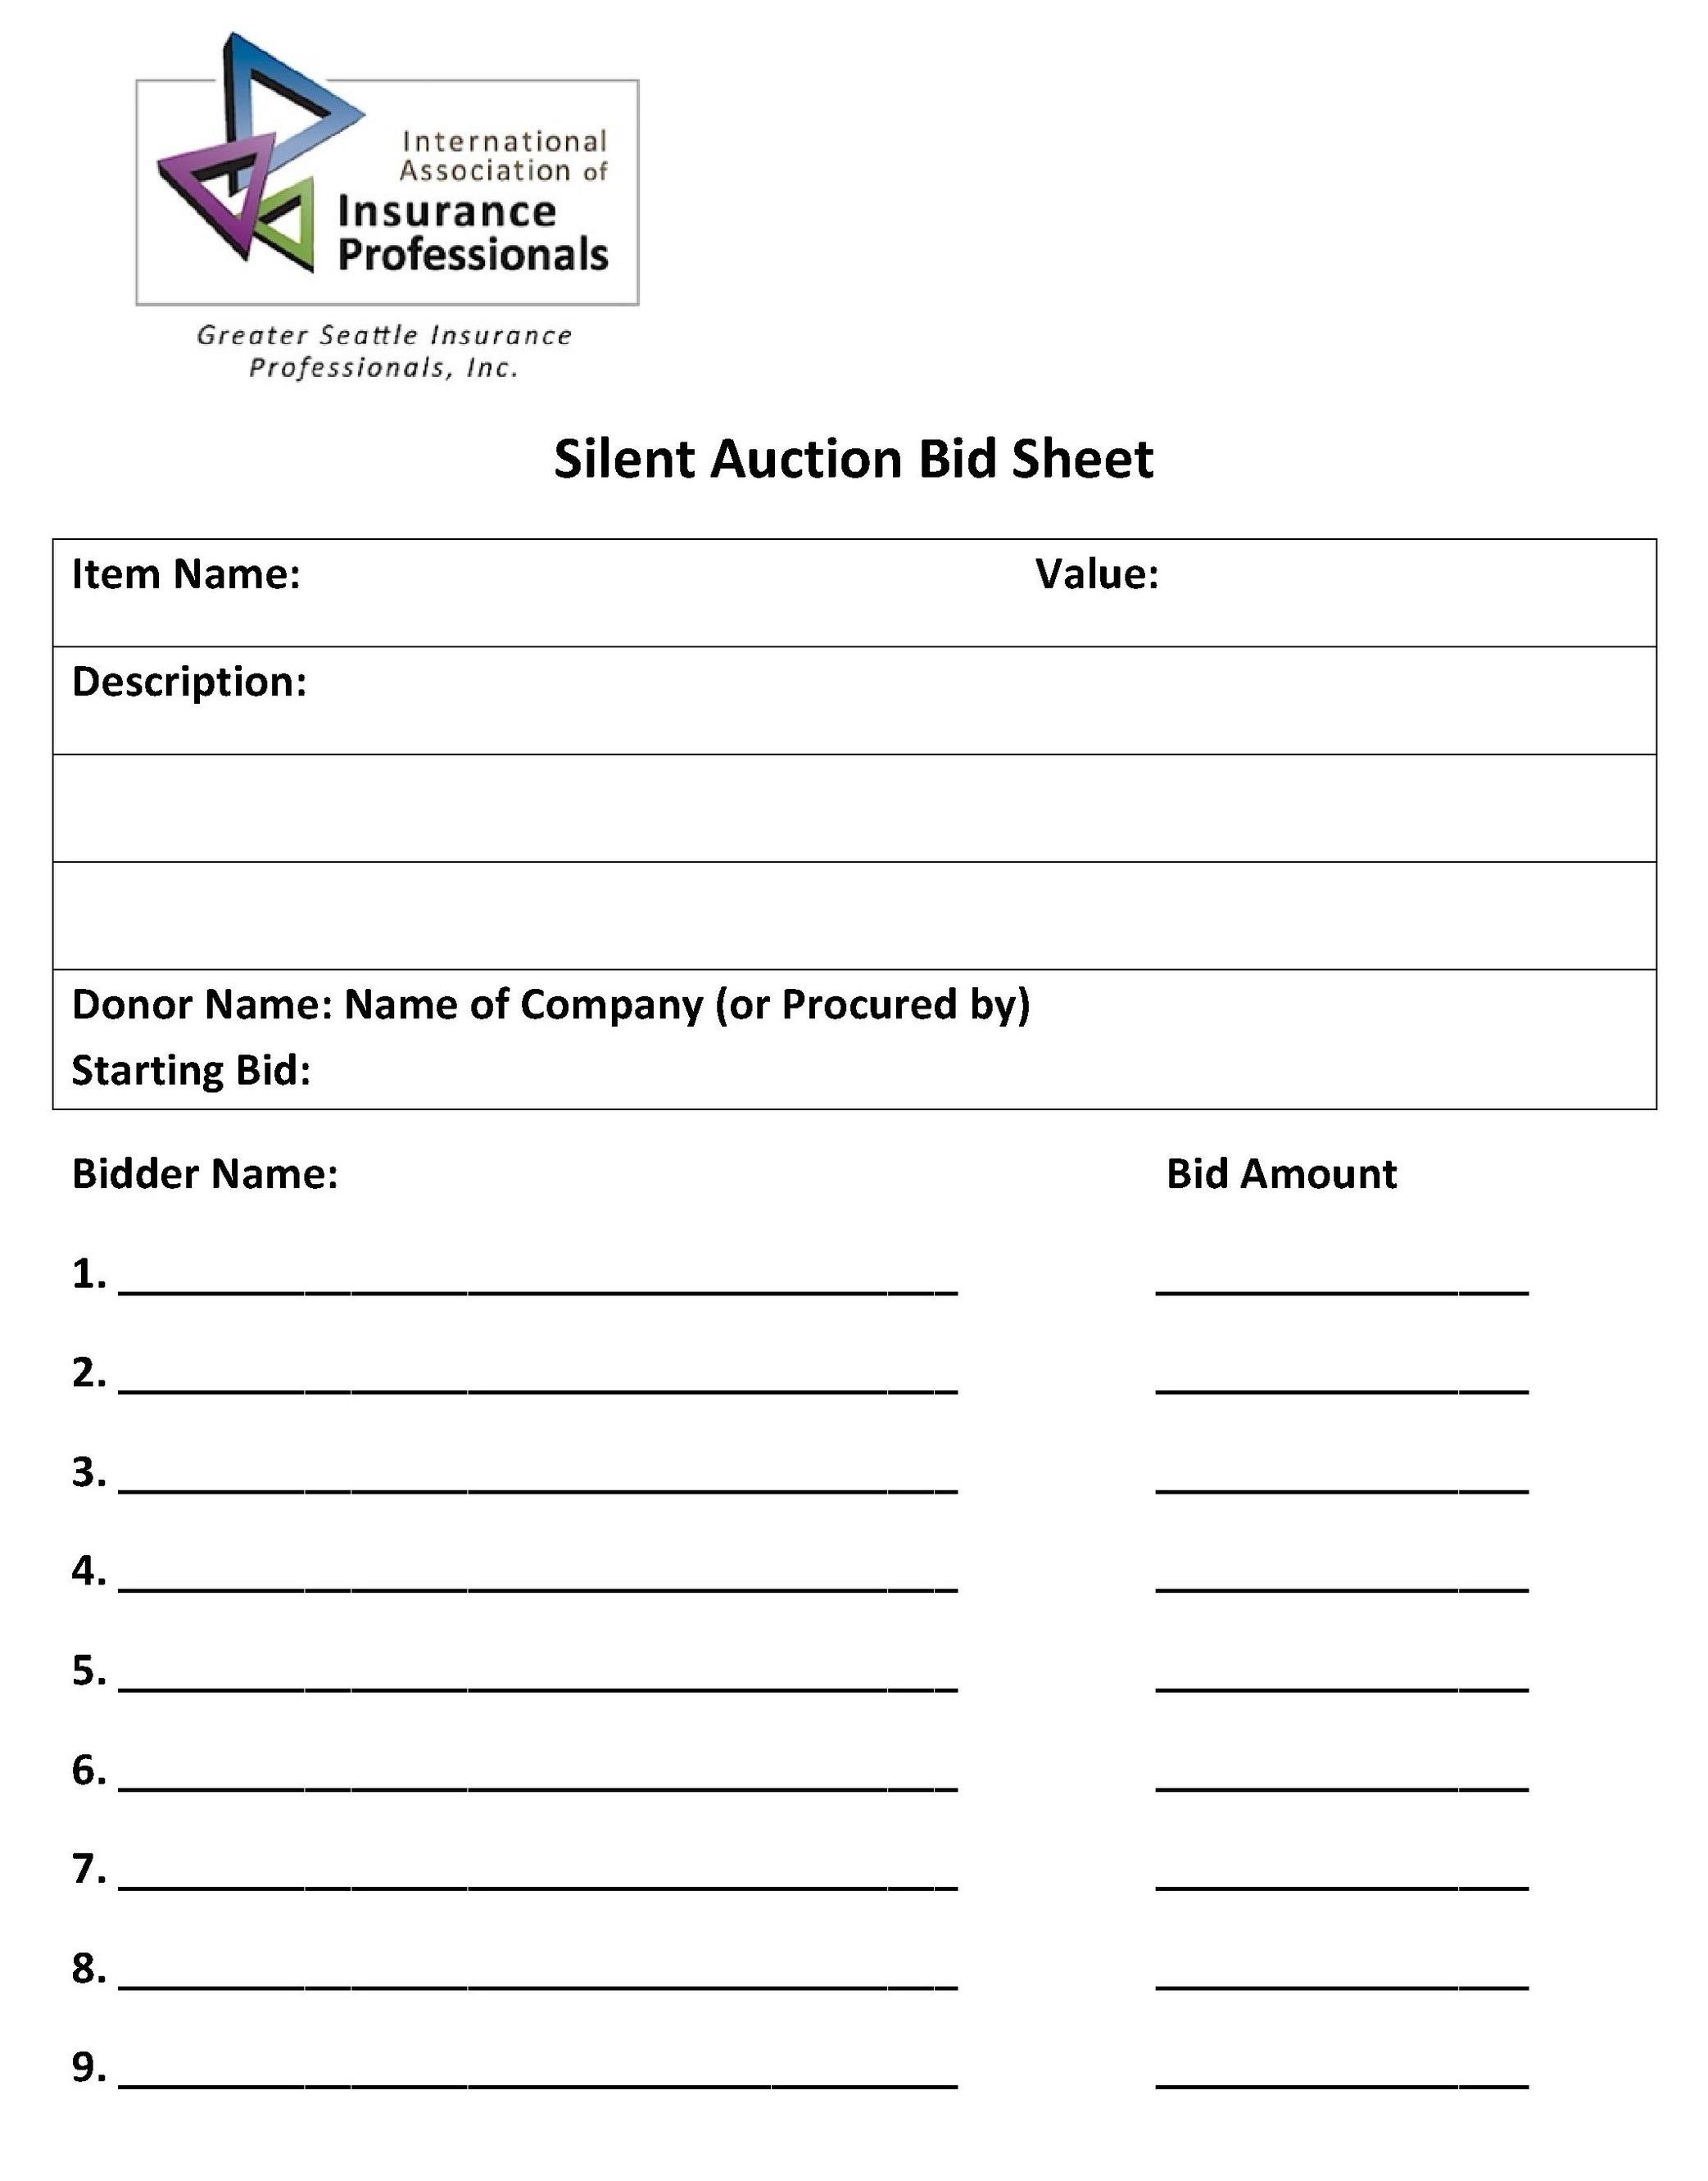 GSIP+-+2-2019+Silent+Auction+Bid+Sheet+-+Blank.jpg